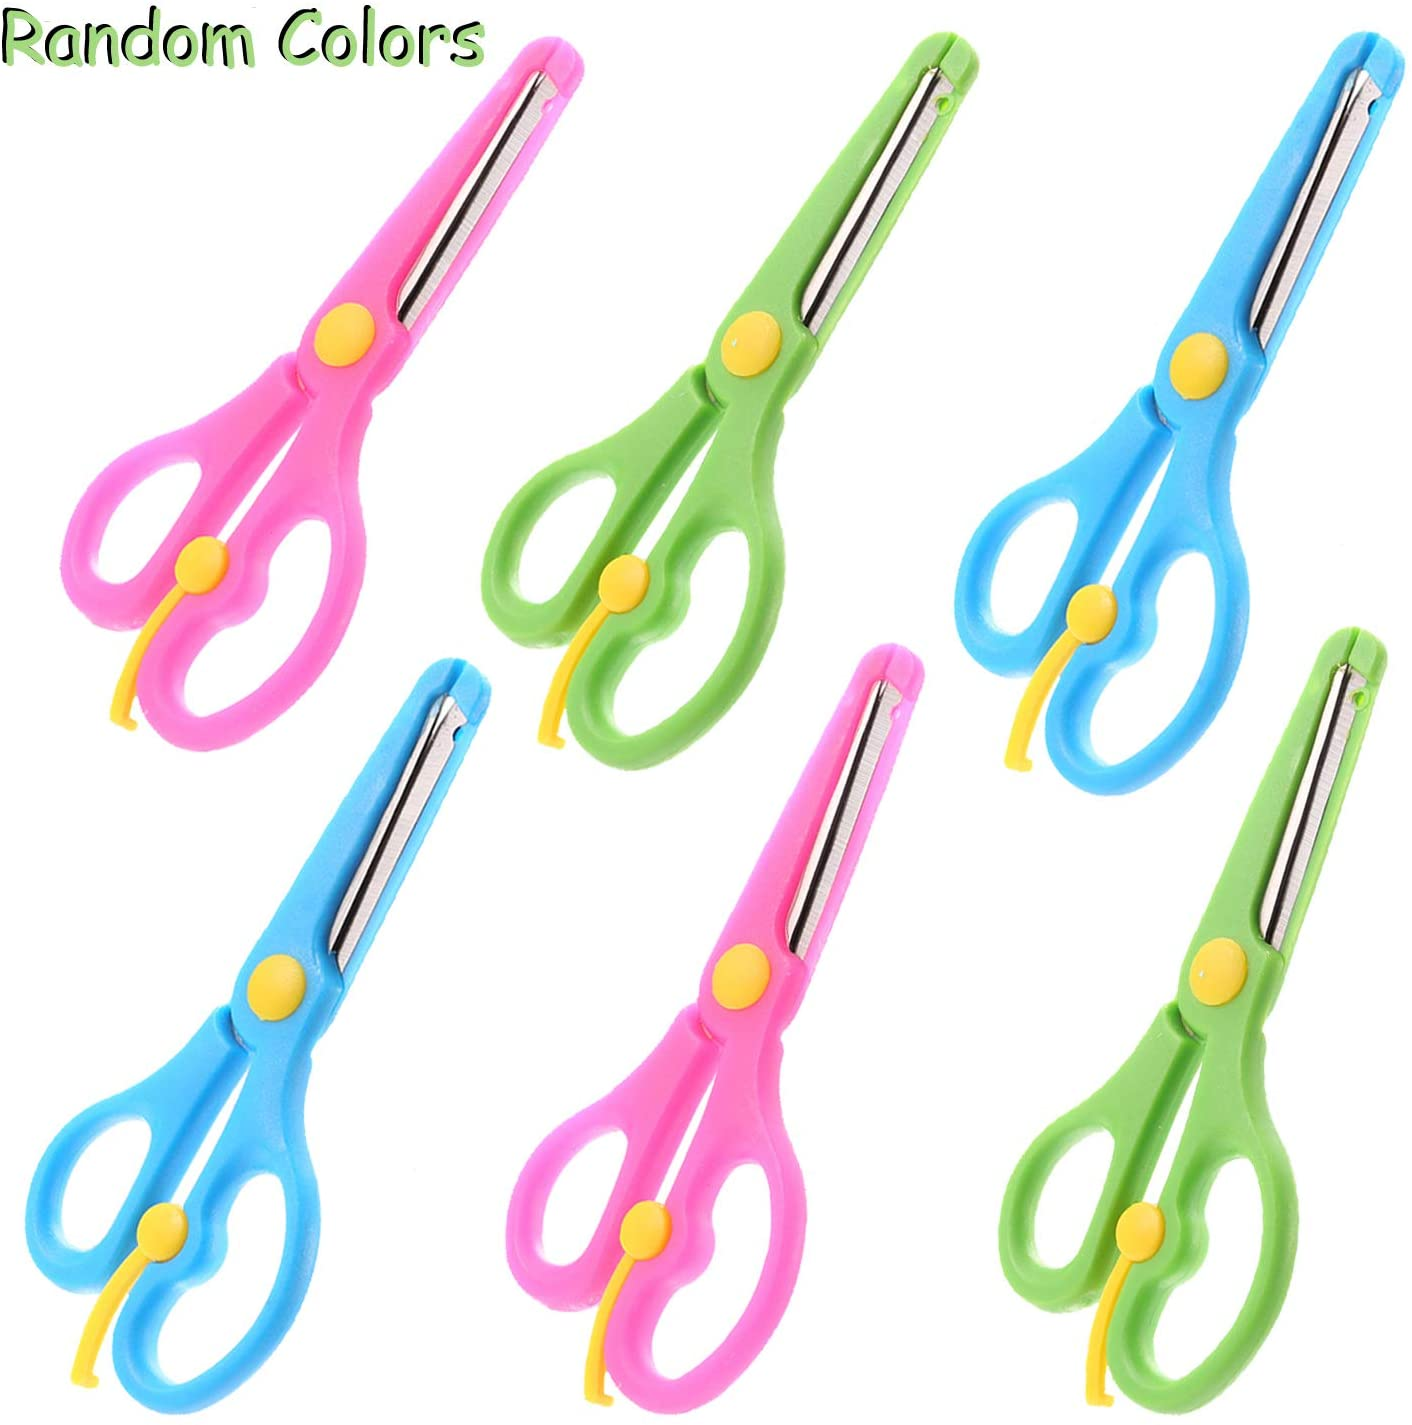 OOTSR 6pcs Child Safety Scissors, Plastic Handle Pre-School Training Scissors with Spring for Scrapbooking / Art Craft/ Teaching (Random Colors)